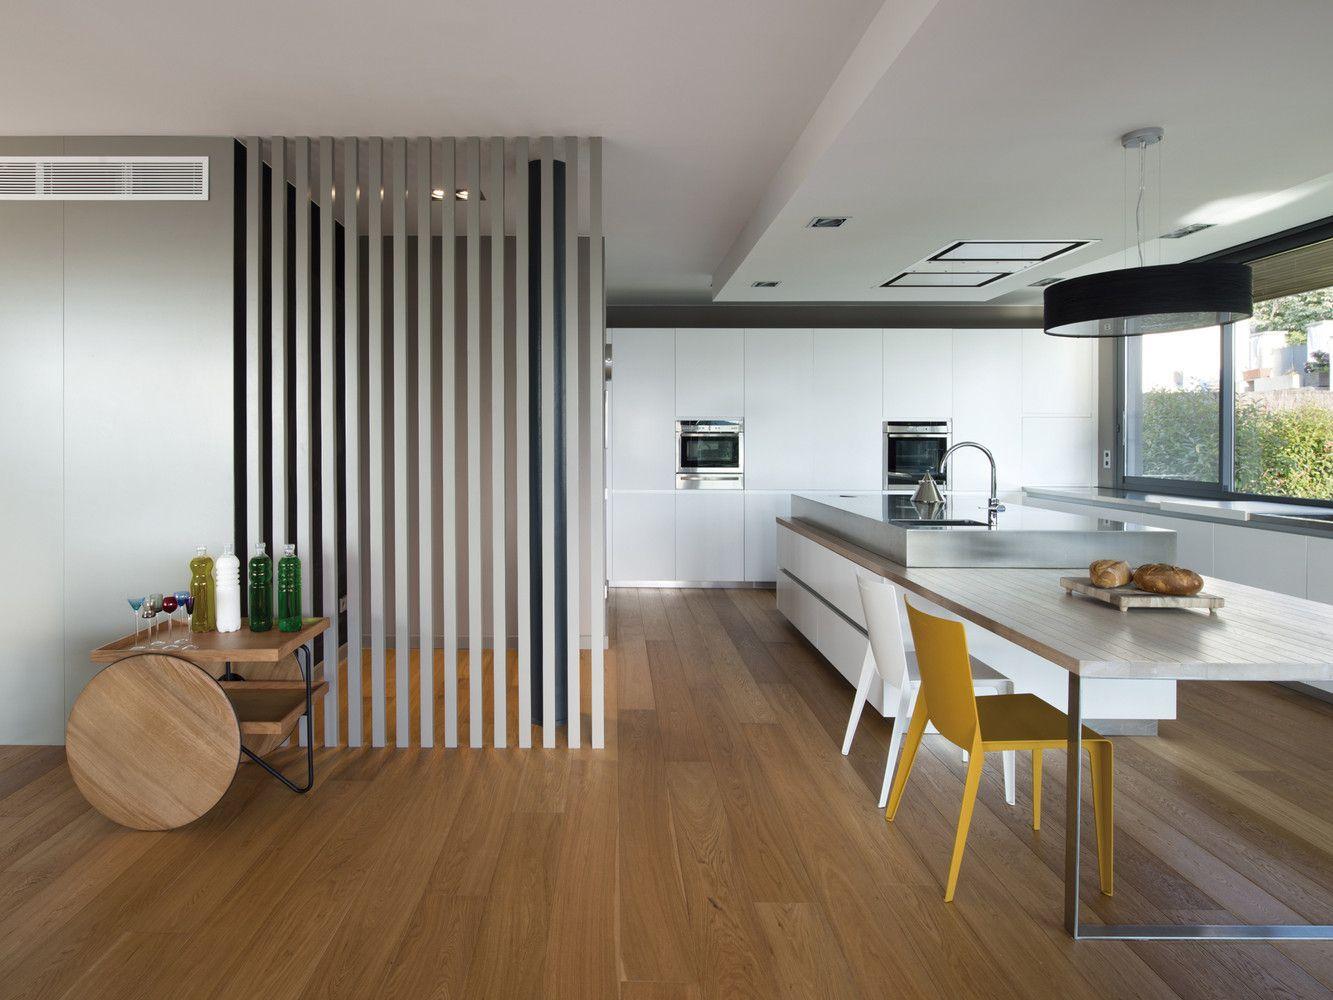 Cozinha gourmet minimalista